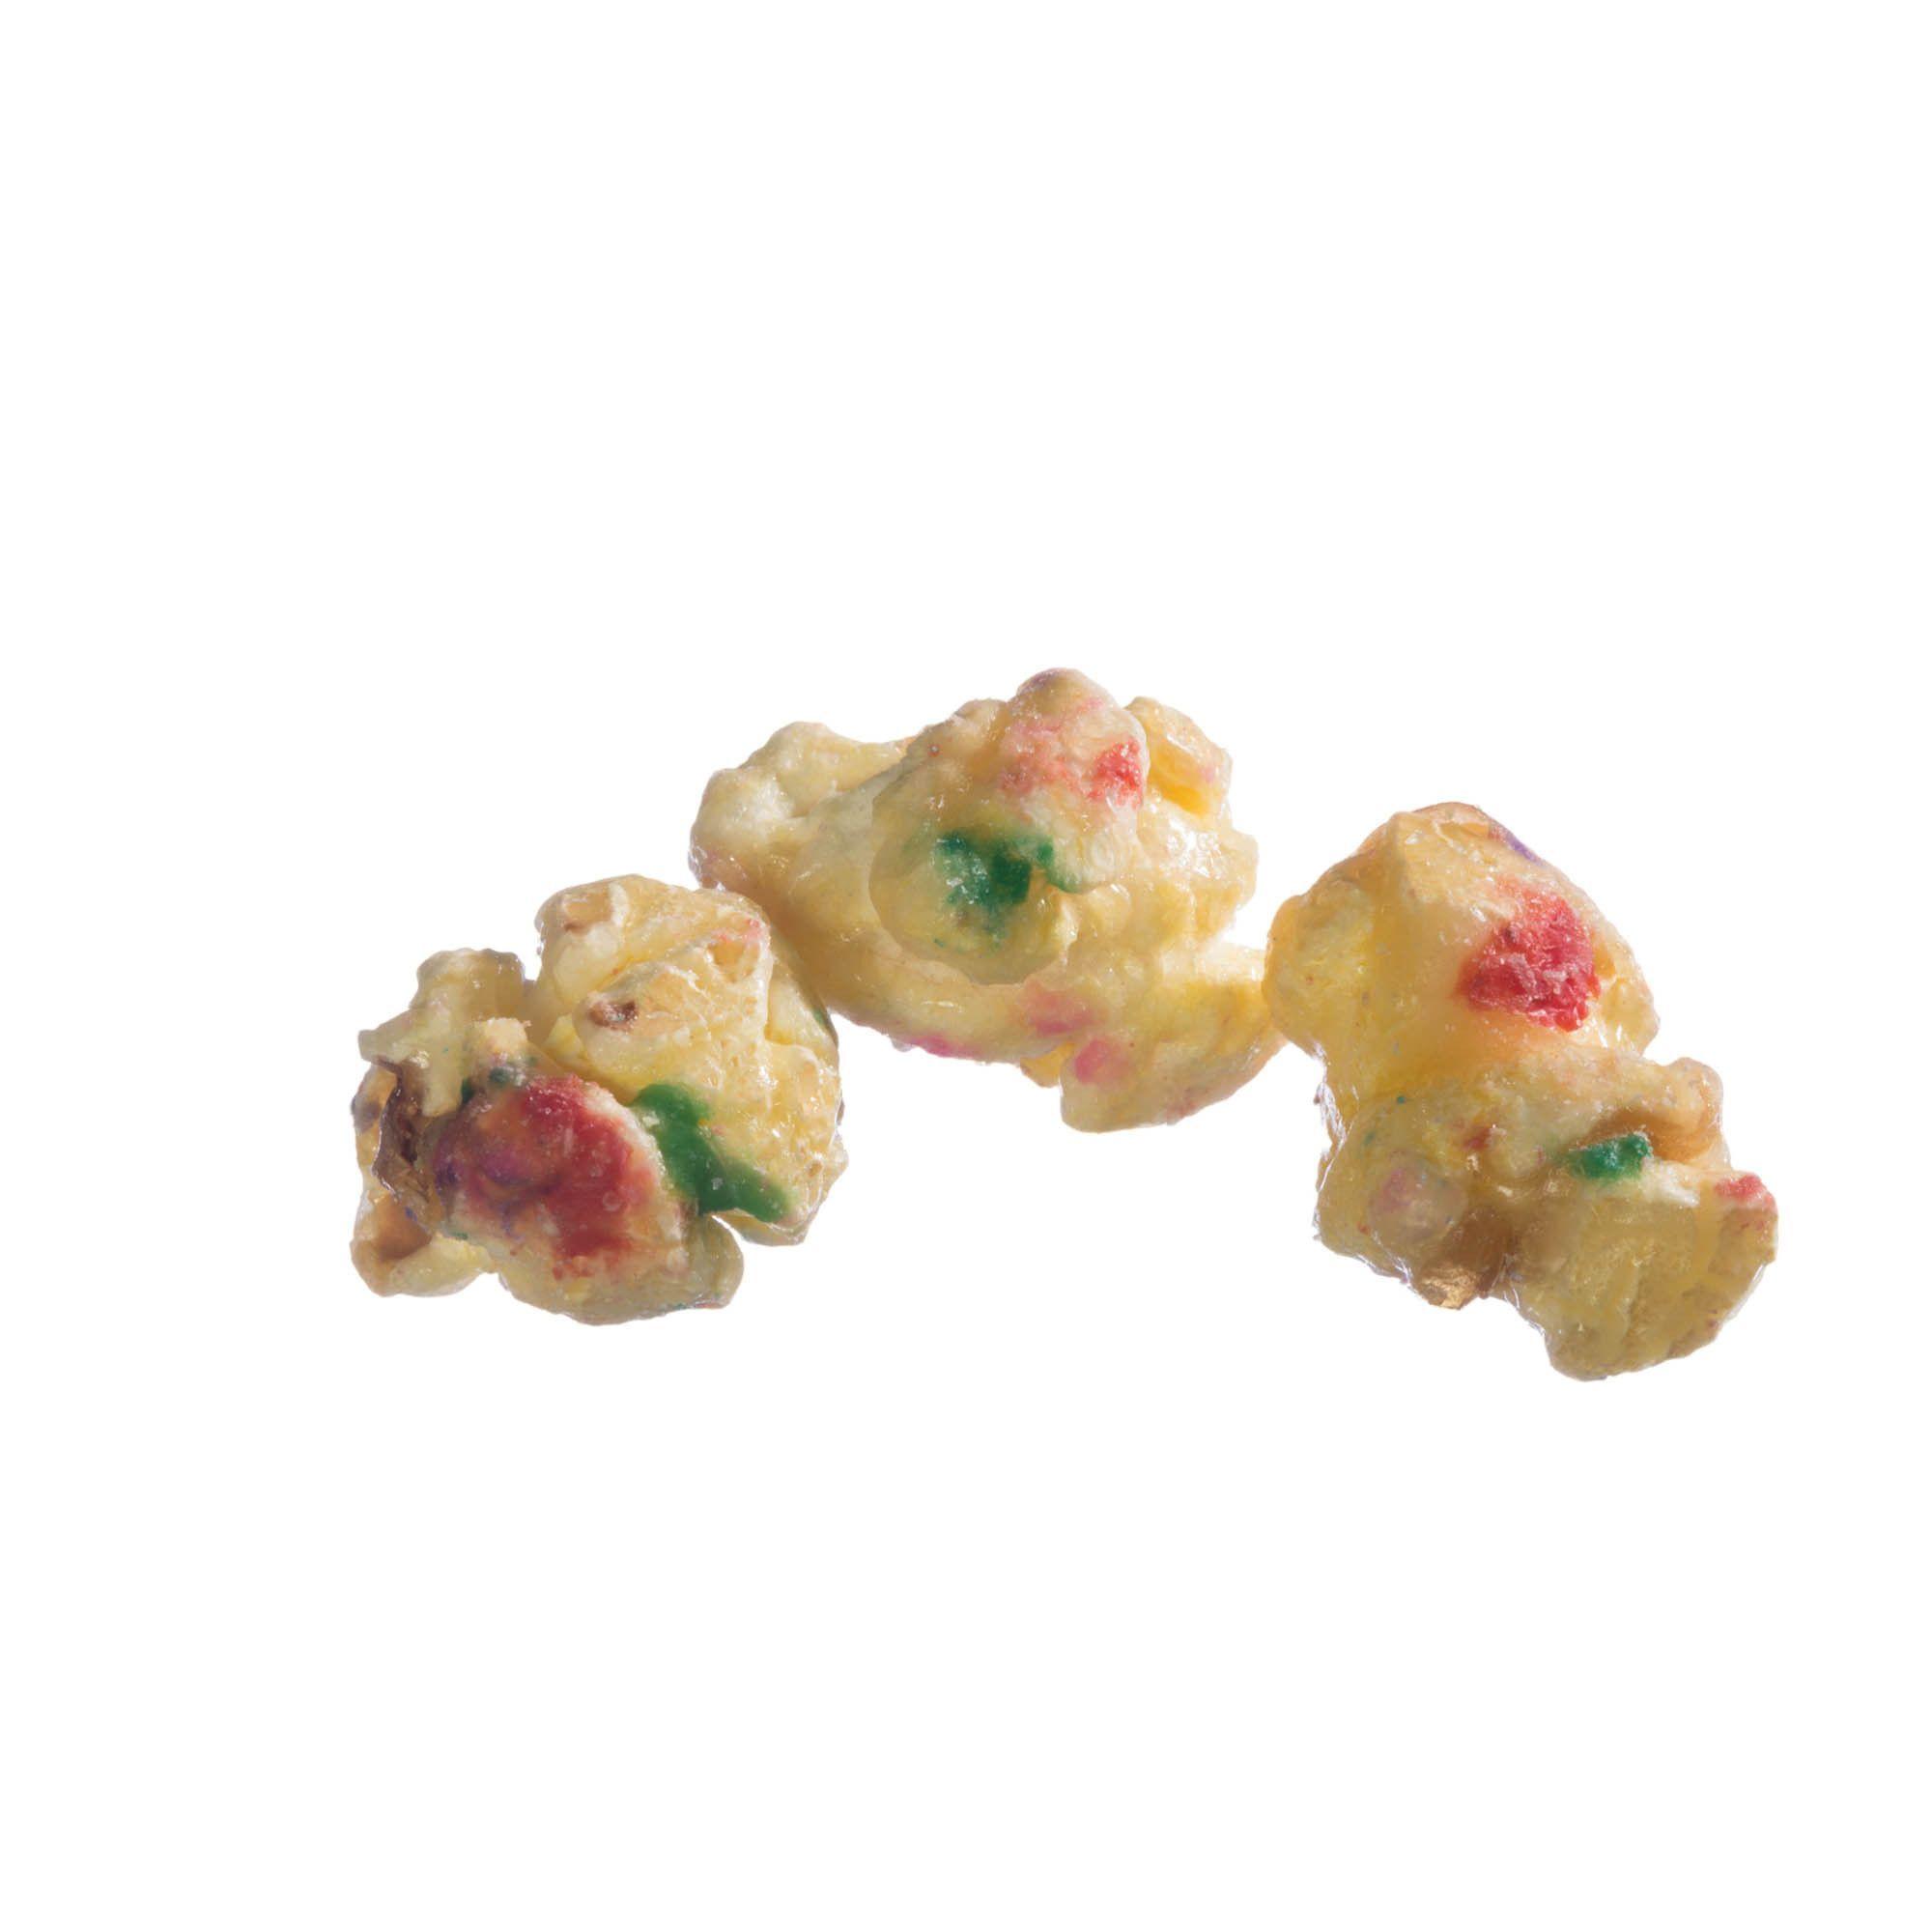 The DIY Popcorn Bar | Popcorn favors, Popcorn and Favors